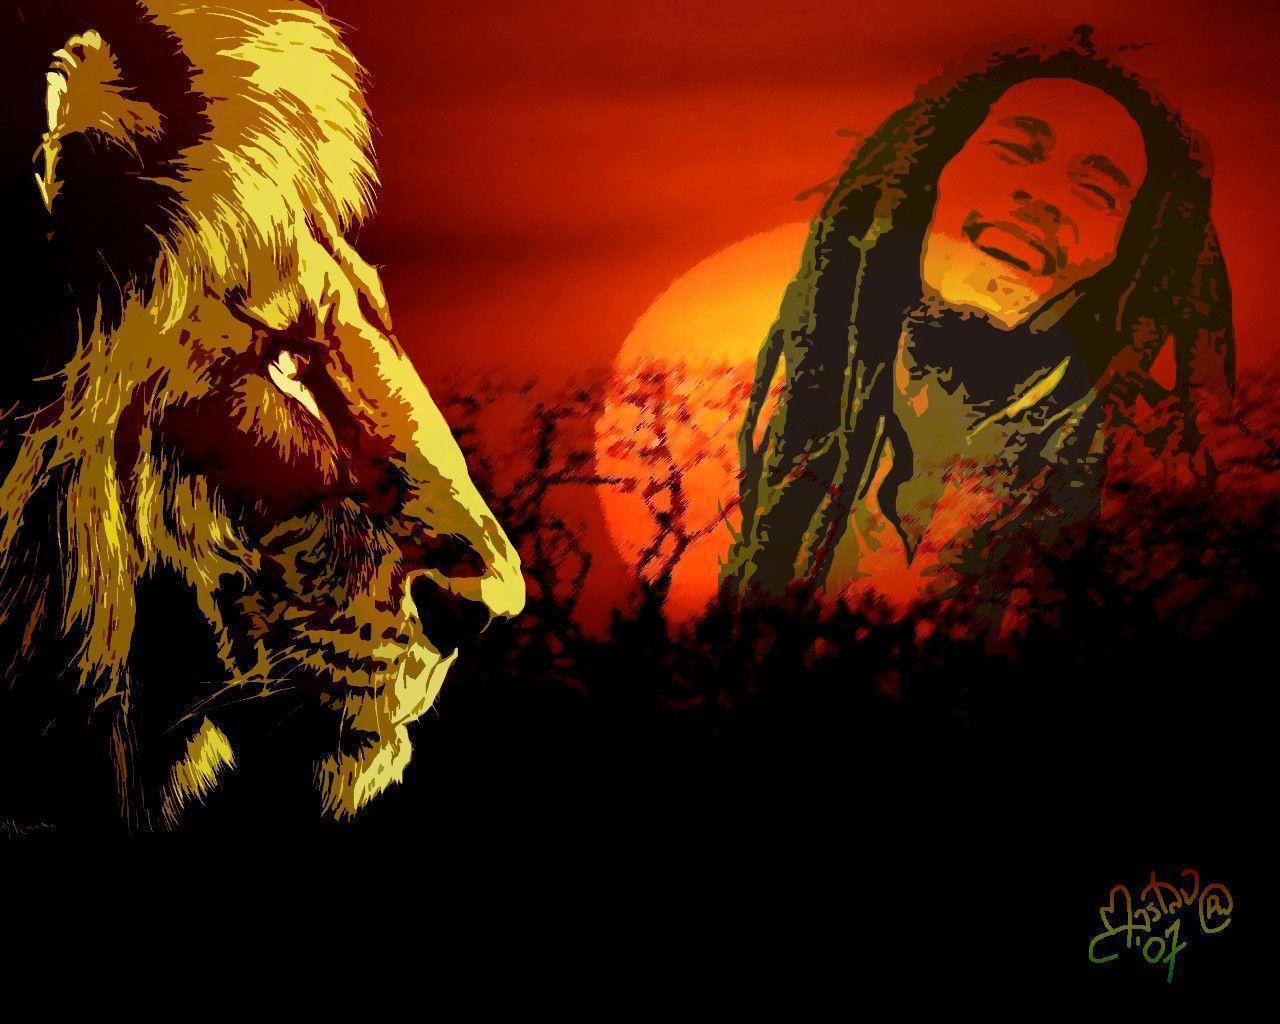 Rasta Lion Hd Wallpaper Bob Marley Backgrounds...